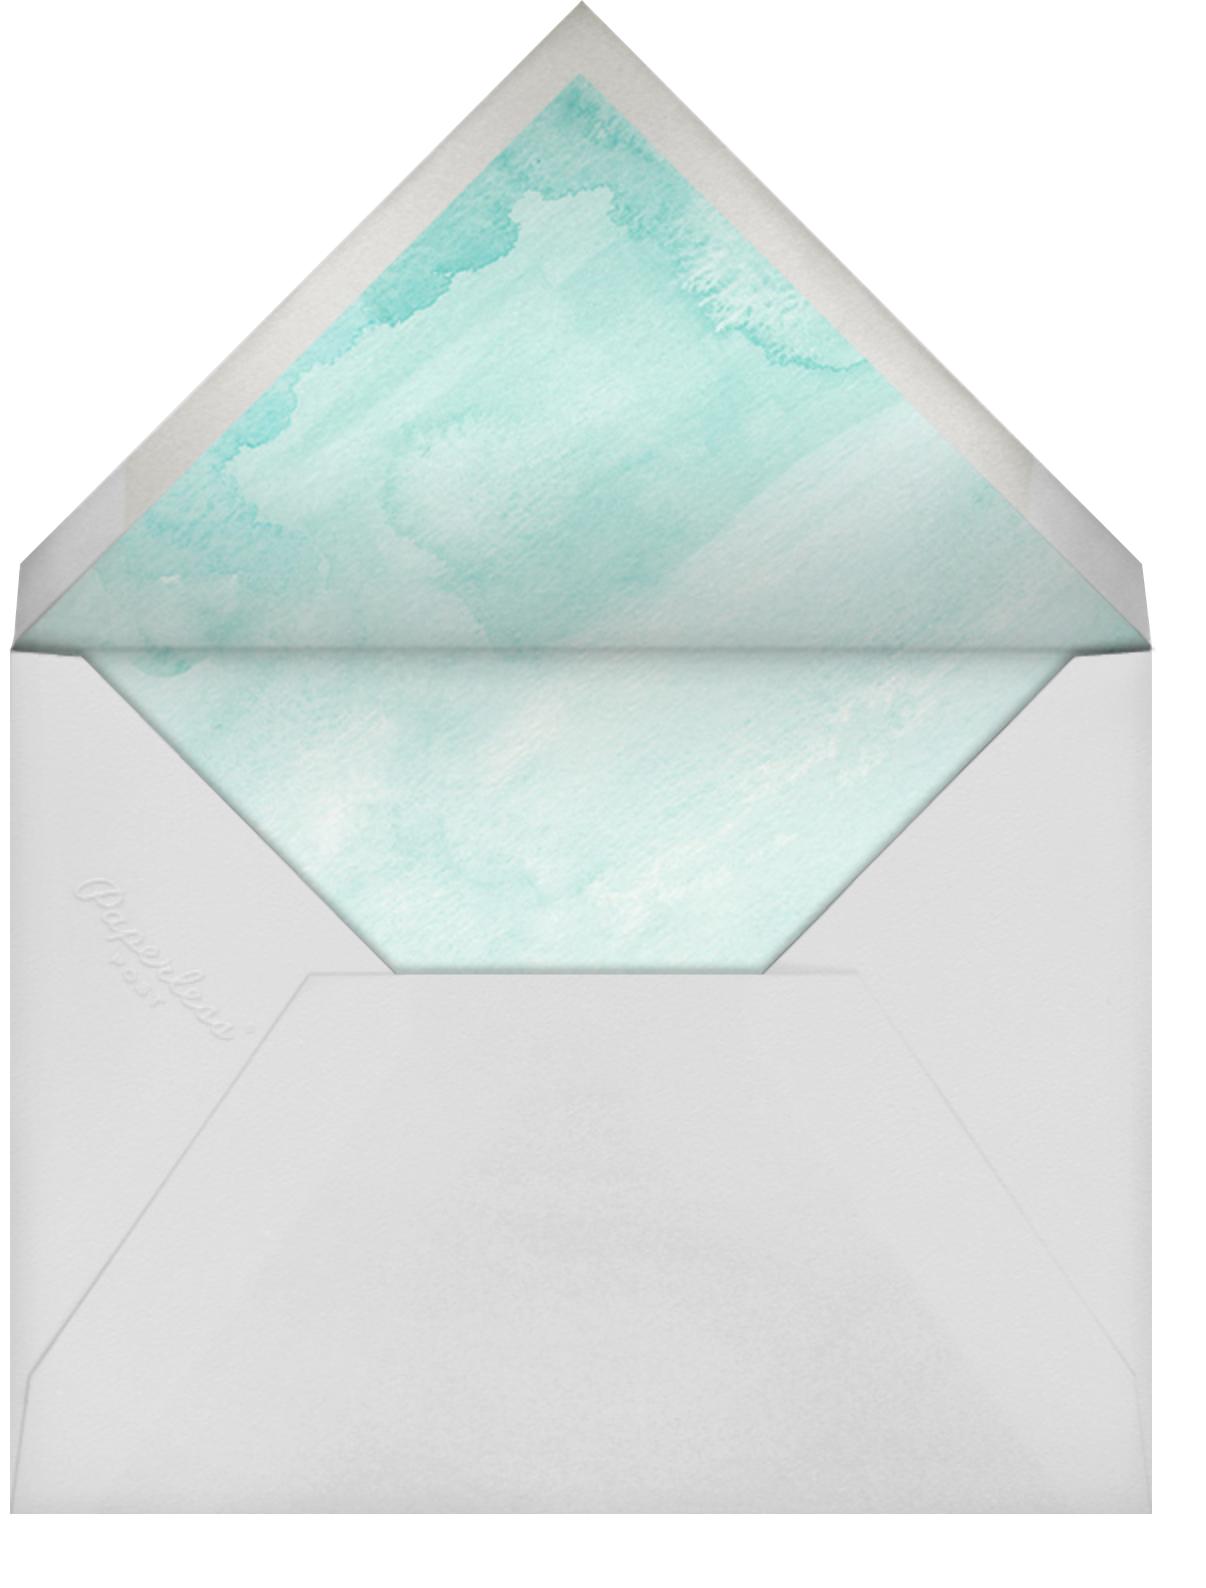 Luau - Paper Source - Adult birthday - envelope back